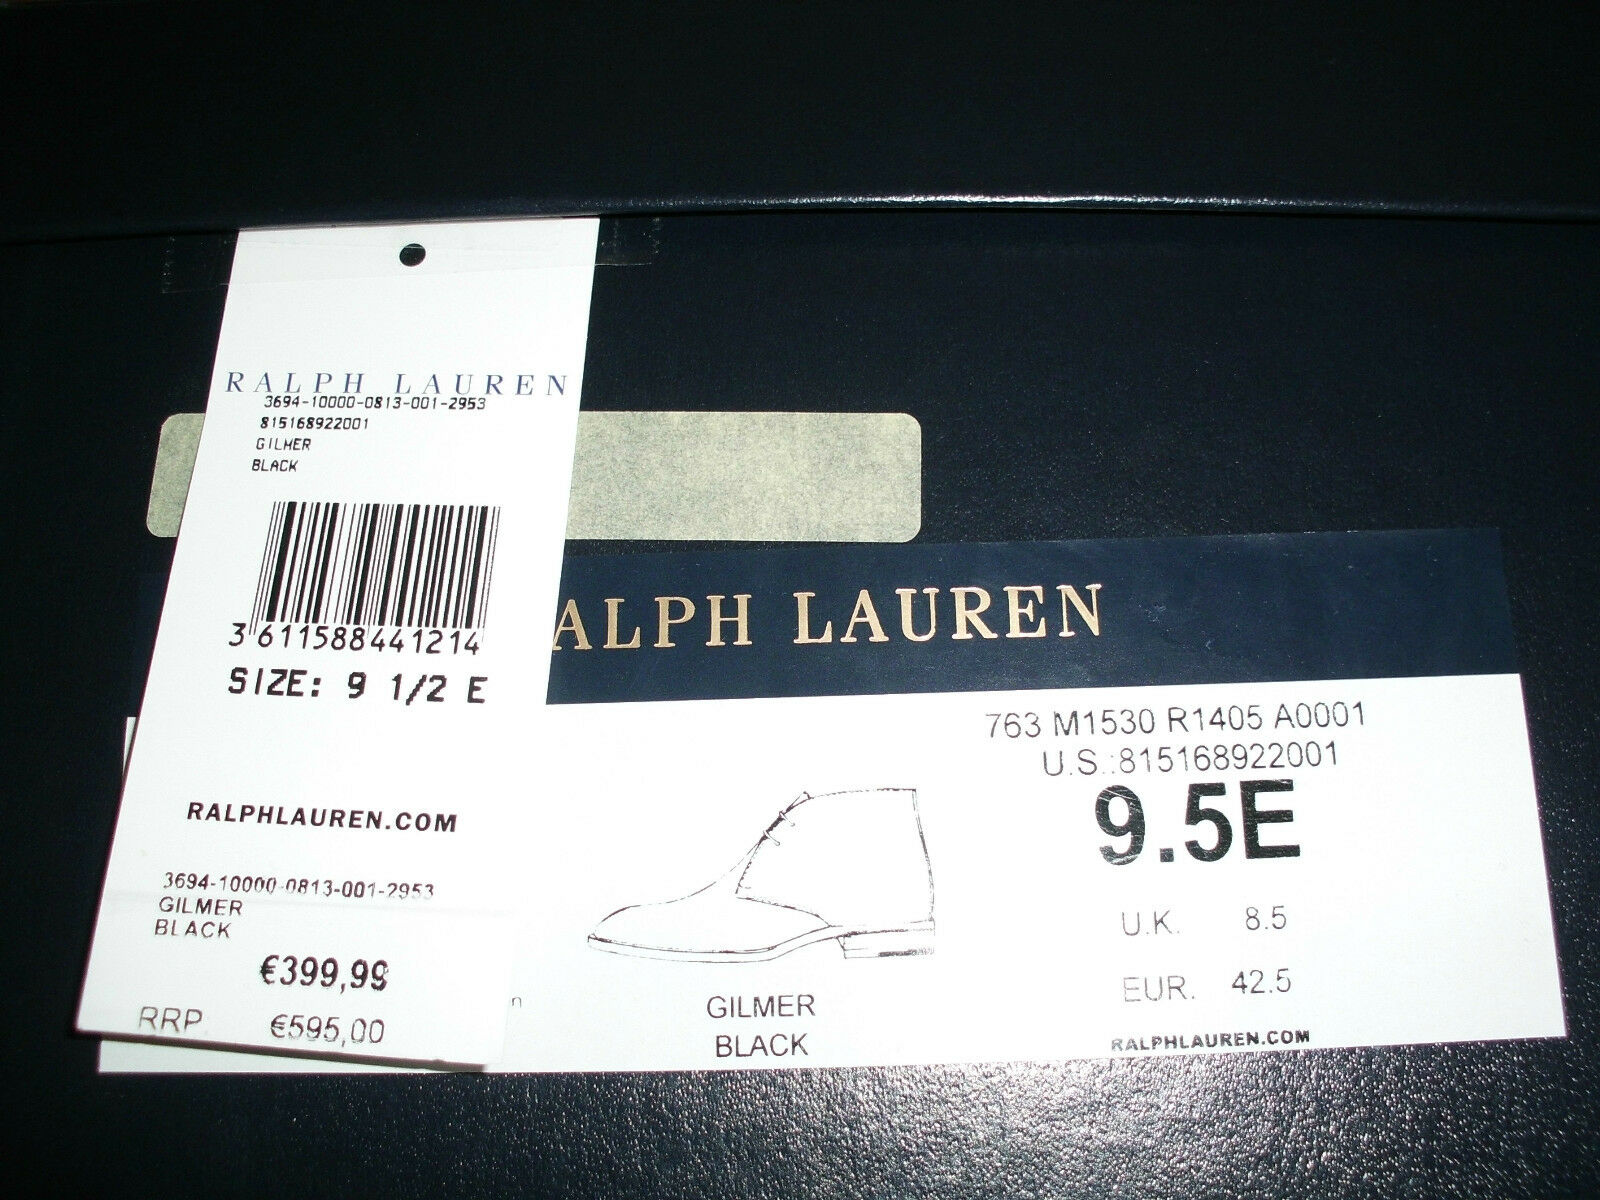 POLO RALPH LAUREN PURPLE LABEL Stiefel GR42,5 STIEFELETTEN SCHWARZ LEDER GR42,5 Stiefel cbb9f6